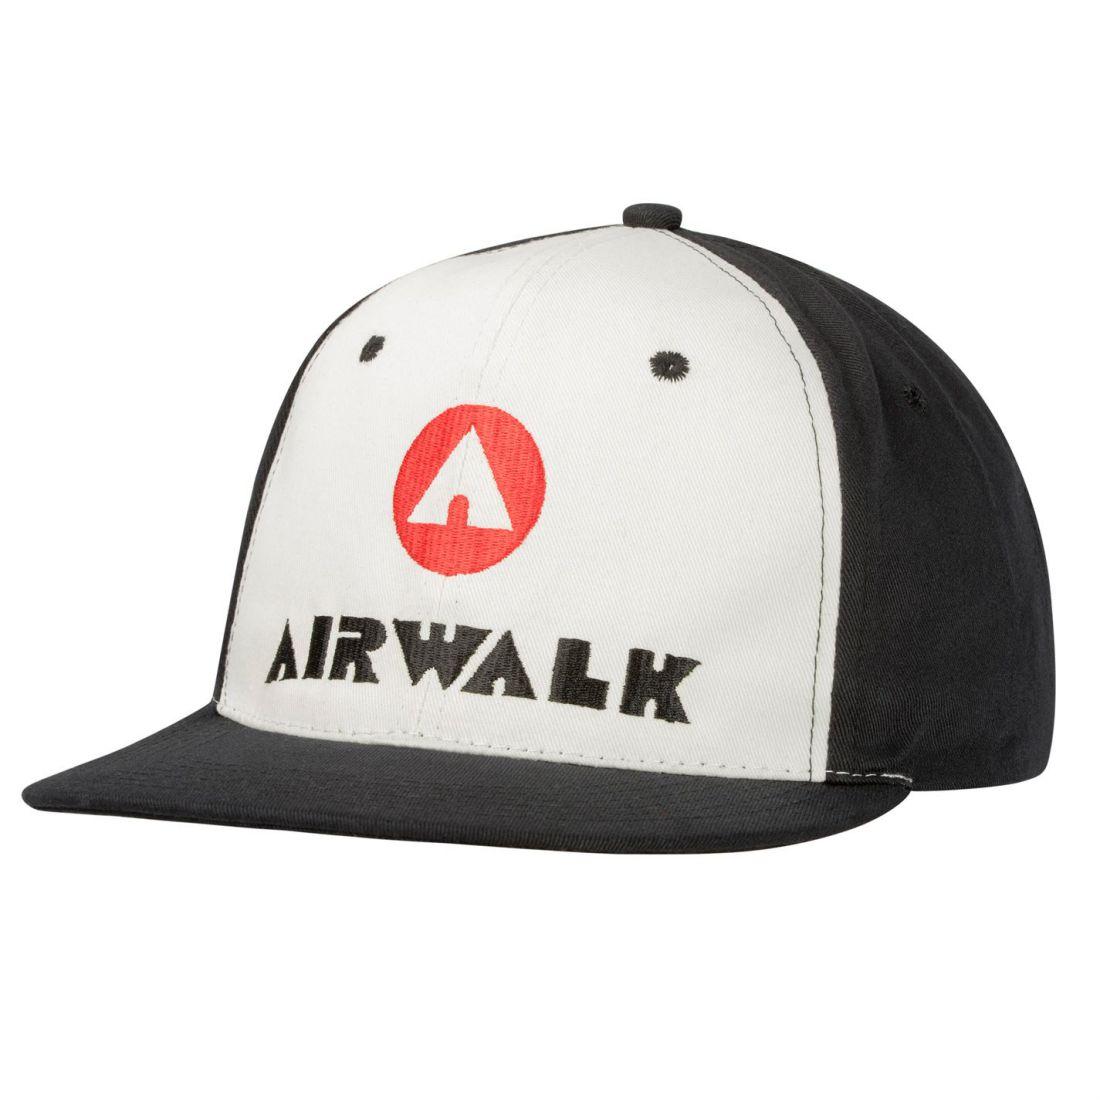 Image is loading Airwalk-Mens-Flat-Peak-Cap c10ad8a6caa6